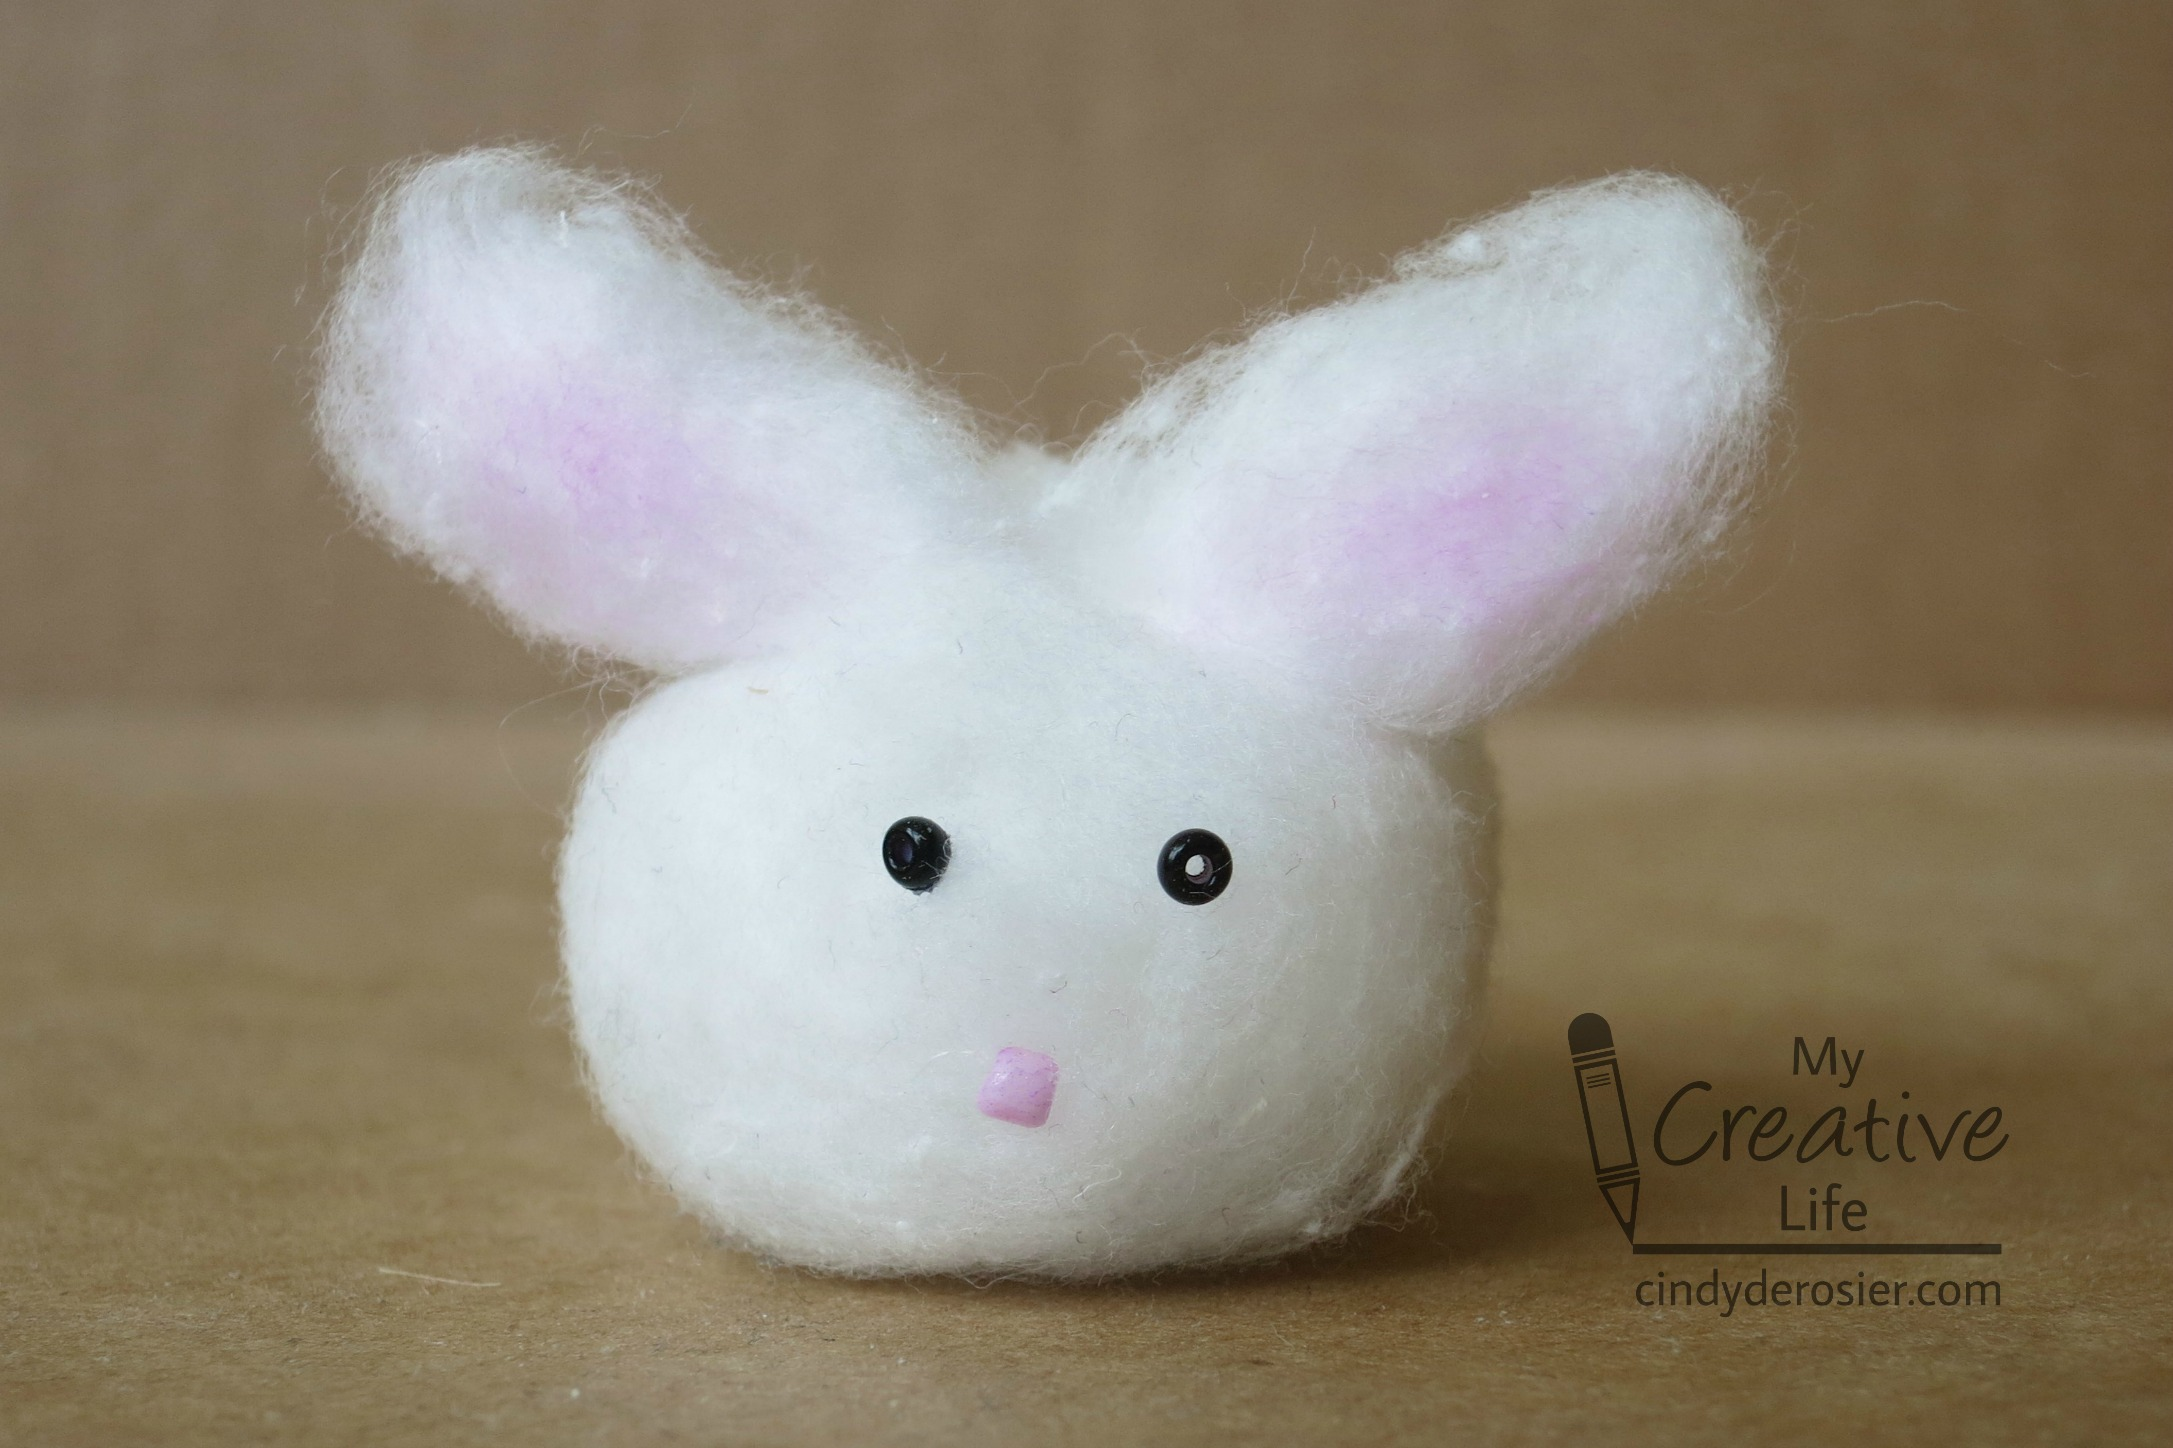 Cotton Ball Bunny Fun Family Crafts